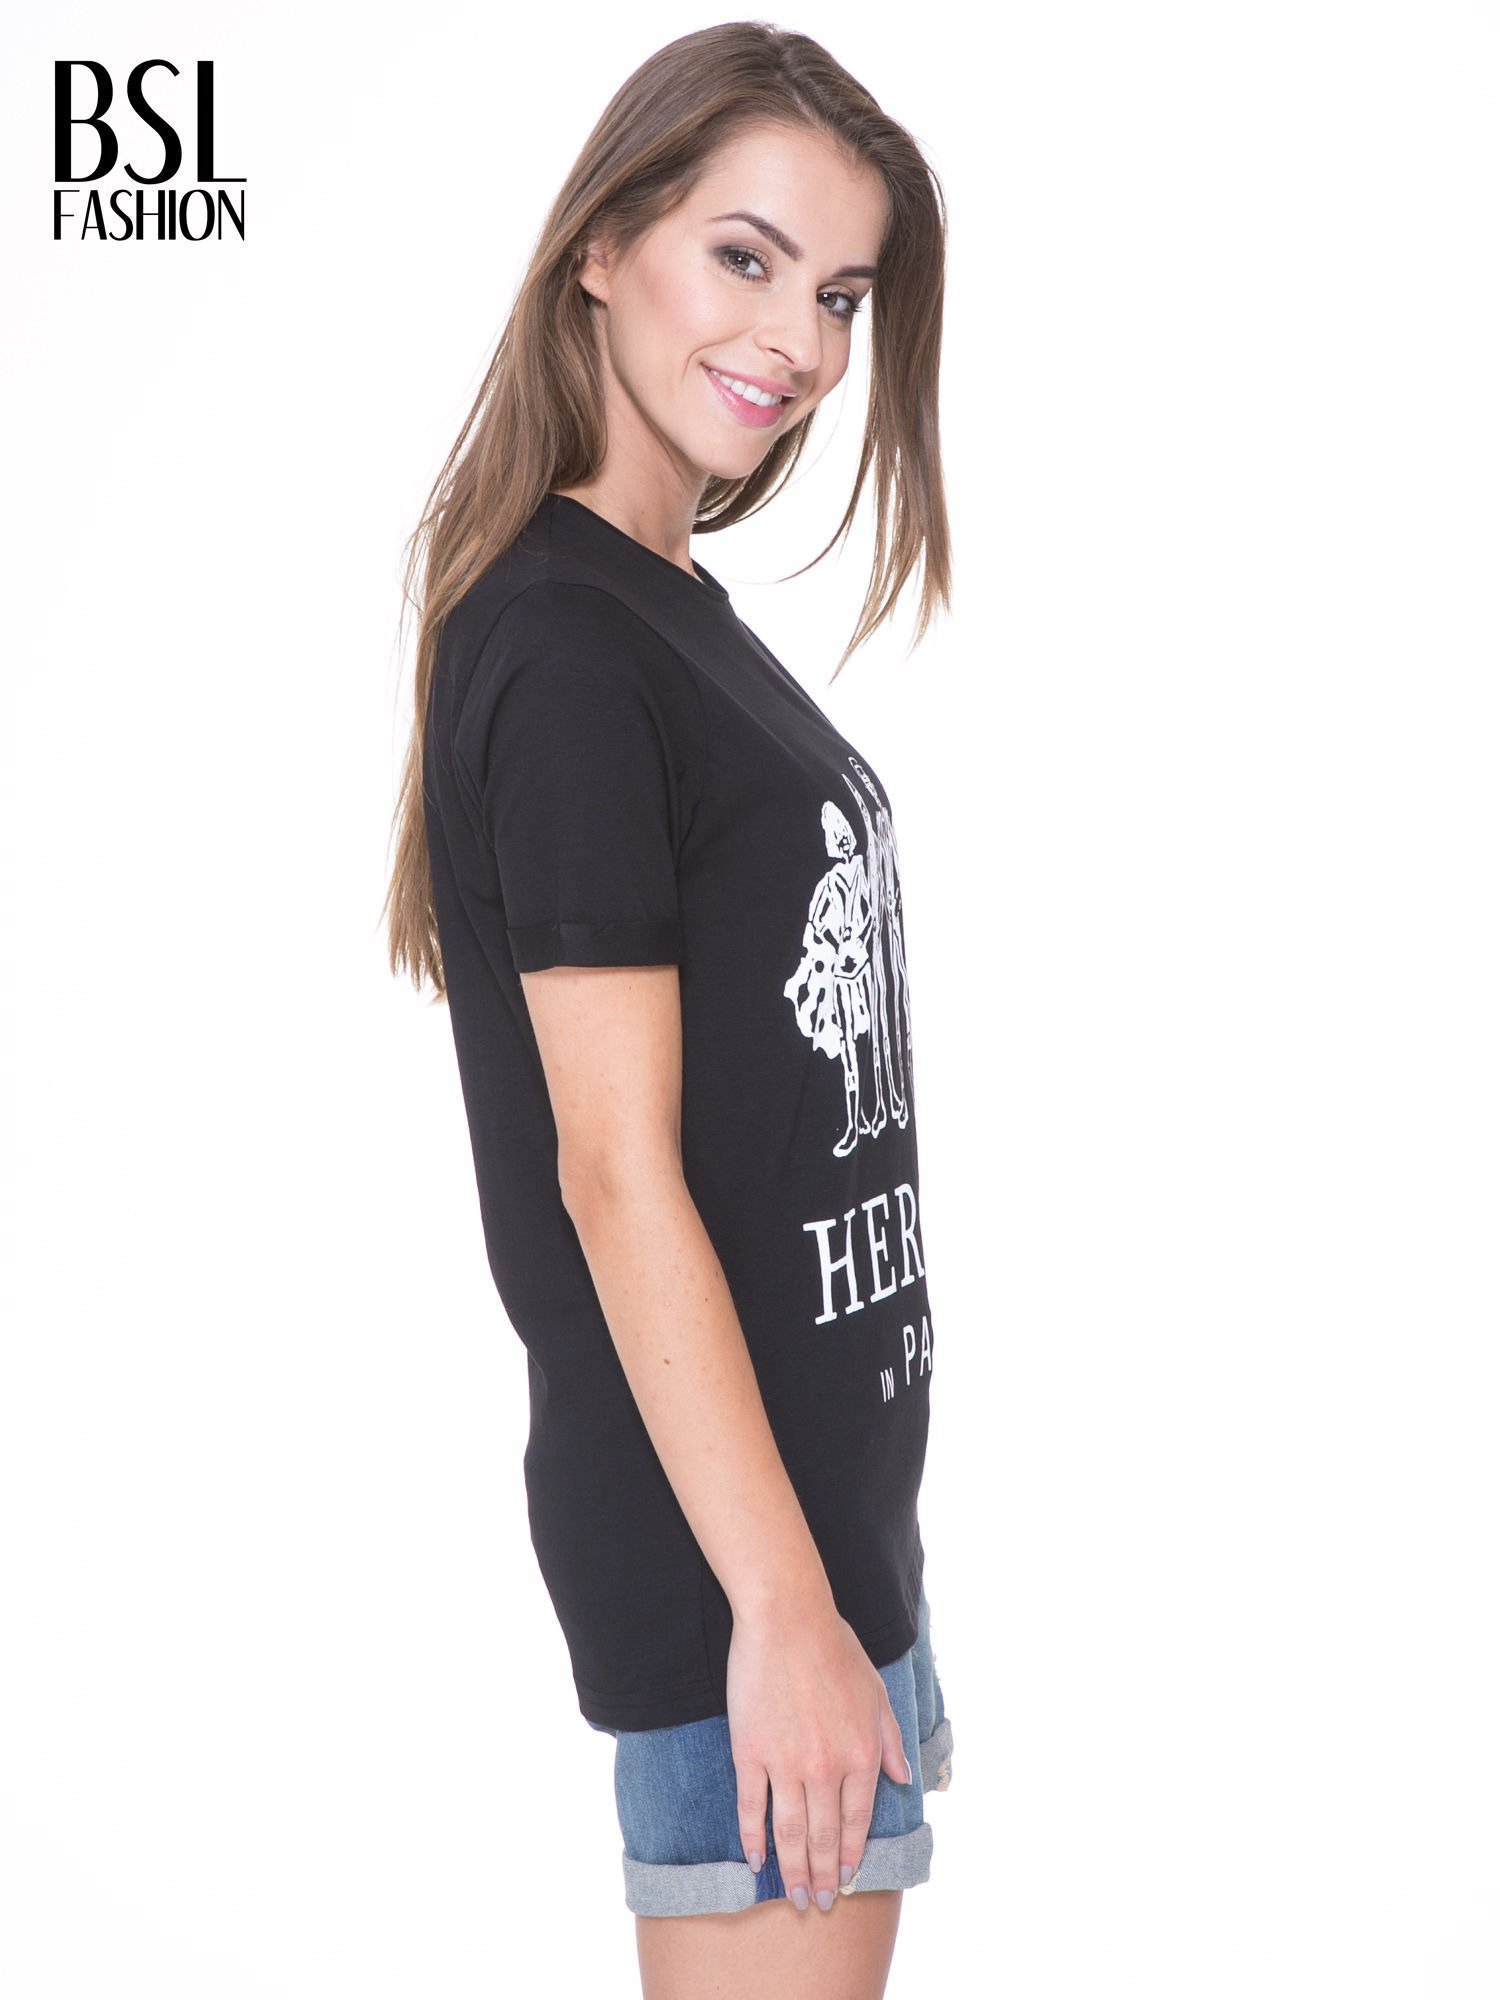 Czarny t-shirt z nadrukiem HEROÉS IN PARIS                                  zdj.                                  3